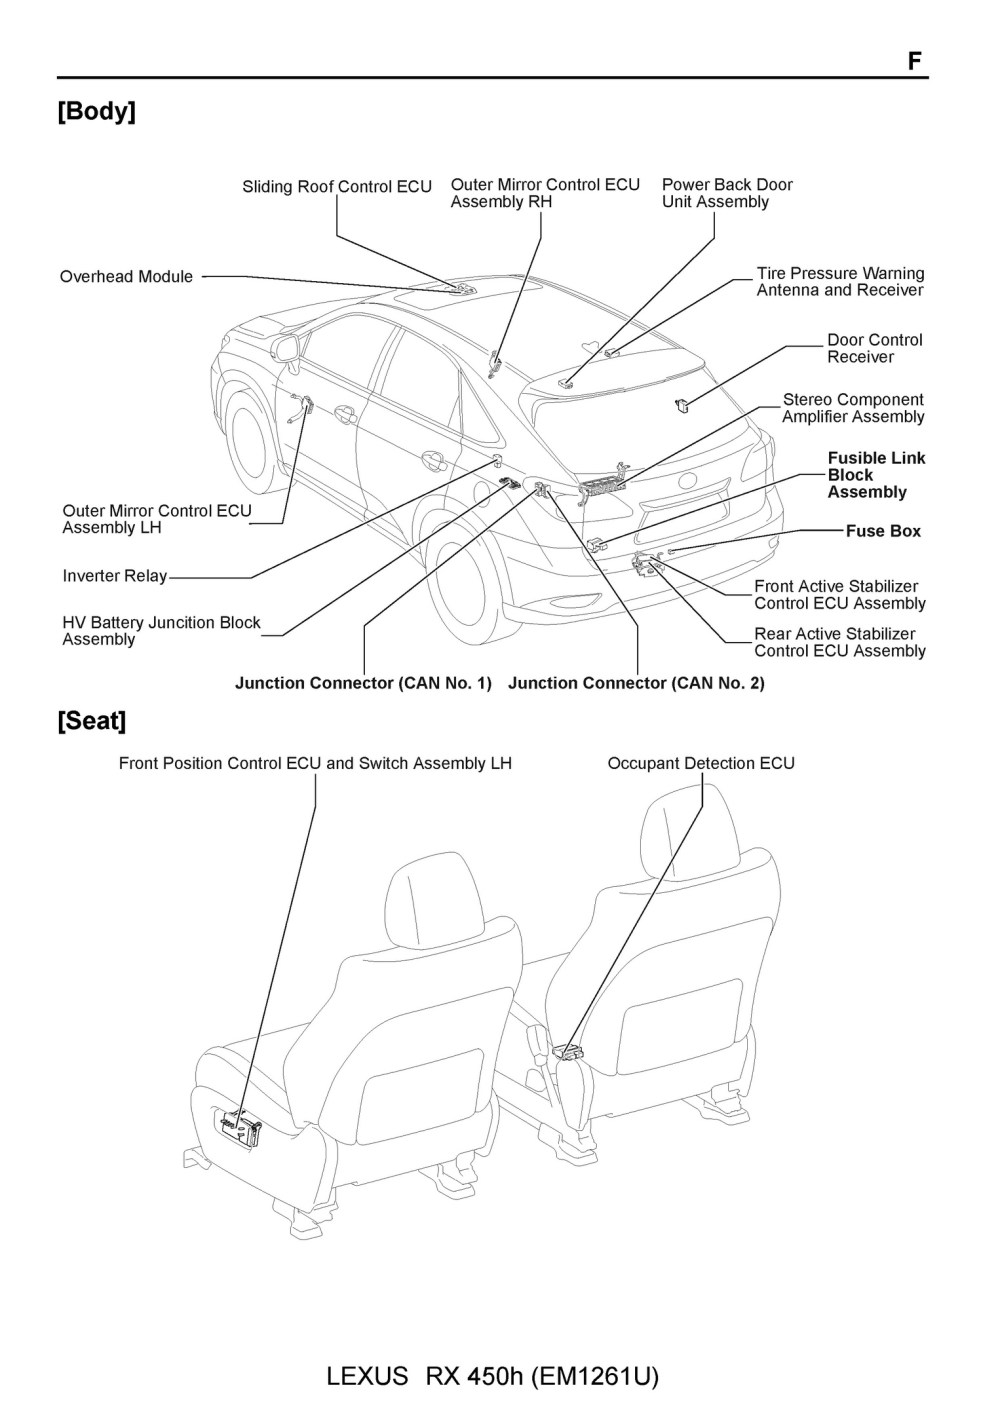 medium resolution of free 2009 lexus rx450h oem electrical wiring diagram pdf